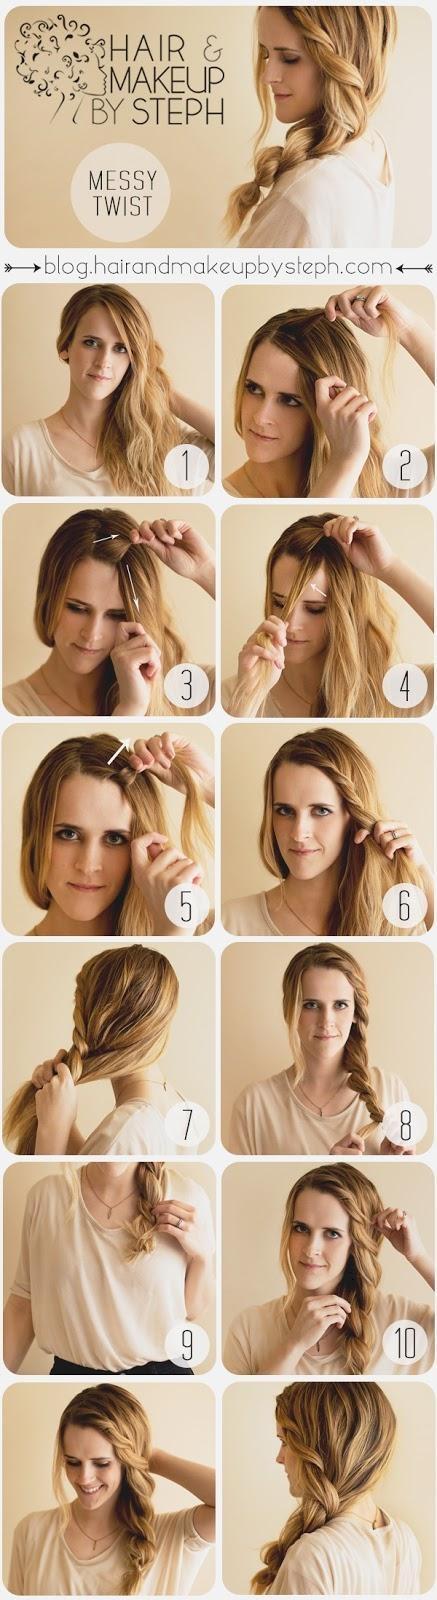 Cute Hairstyles Hair Tutorial with Twist